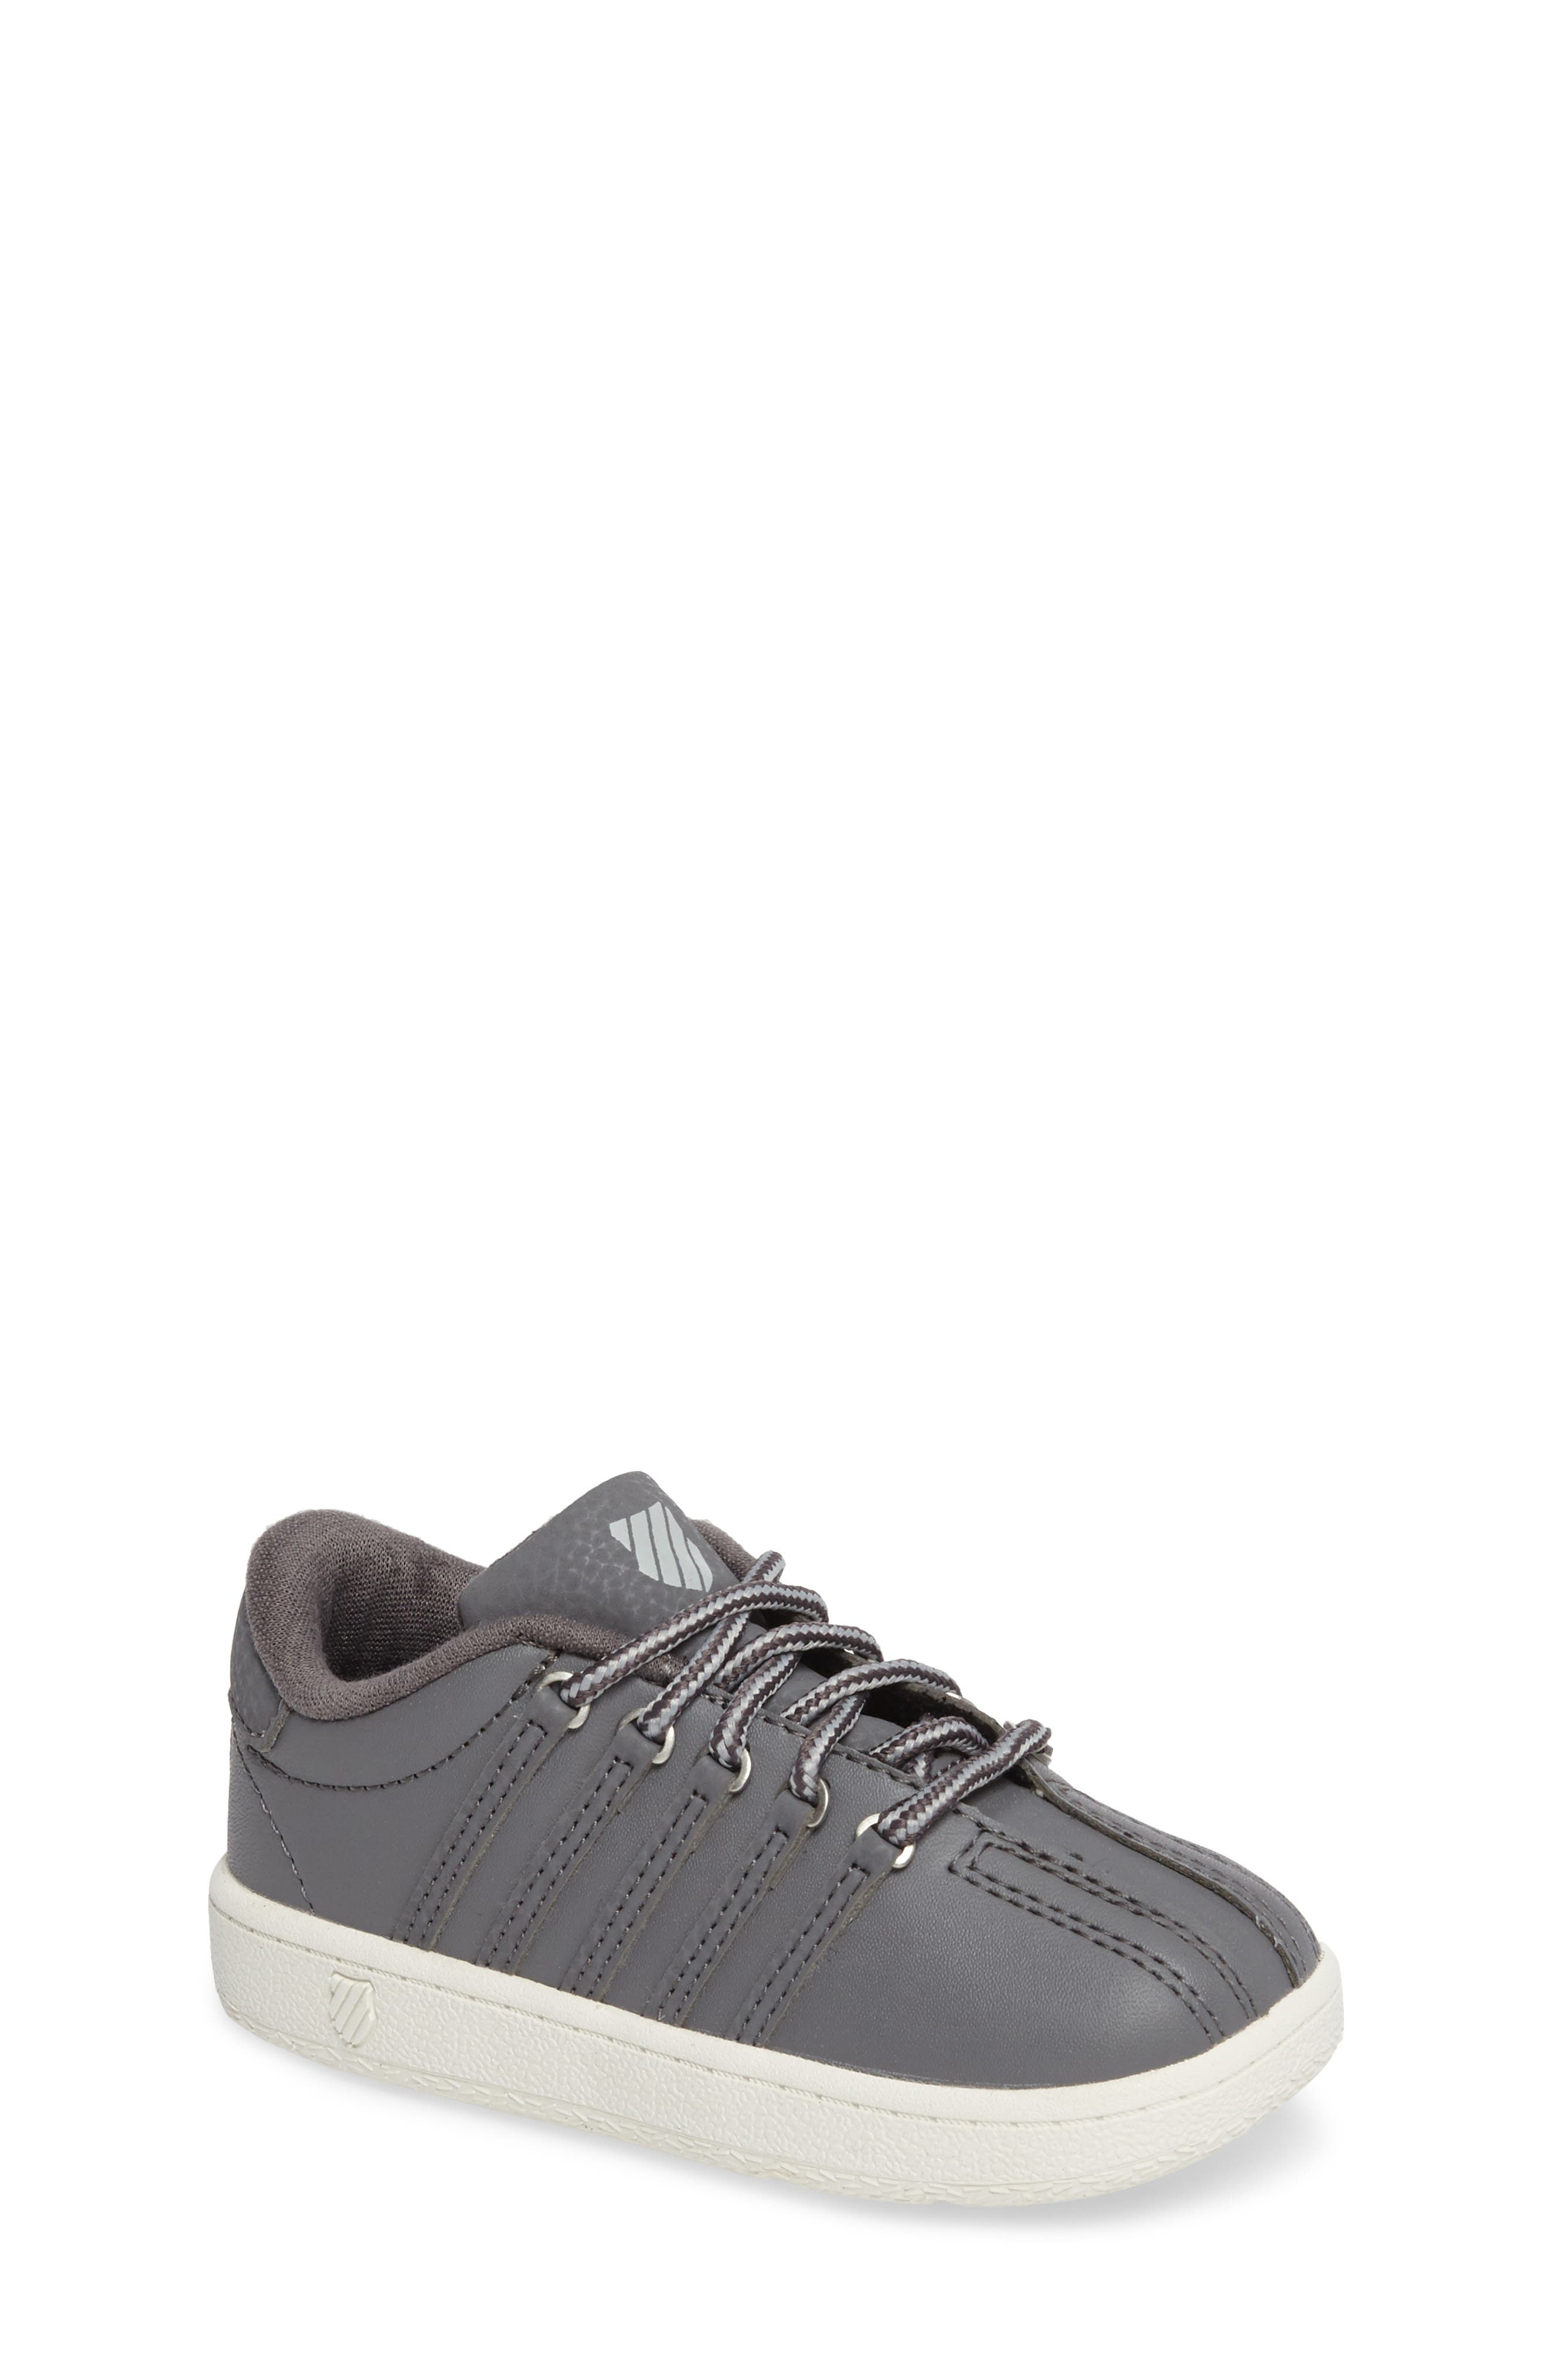 Classic VN Sneaker,                             Main thumbnail 1, color,                             075